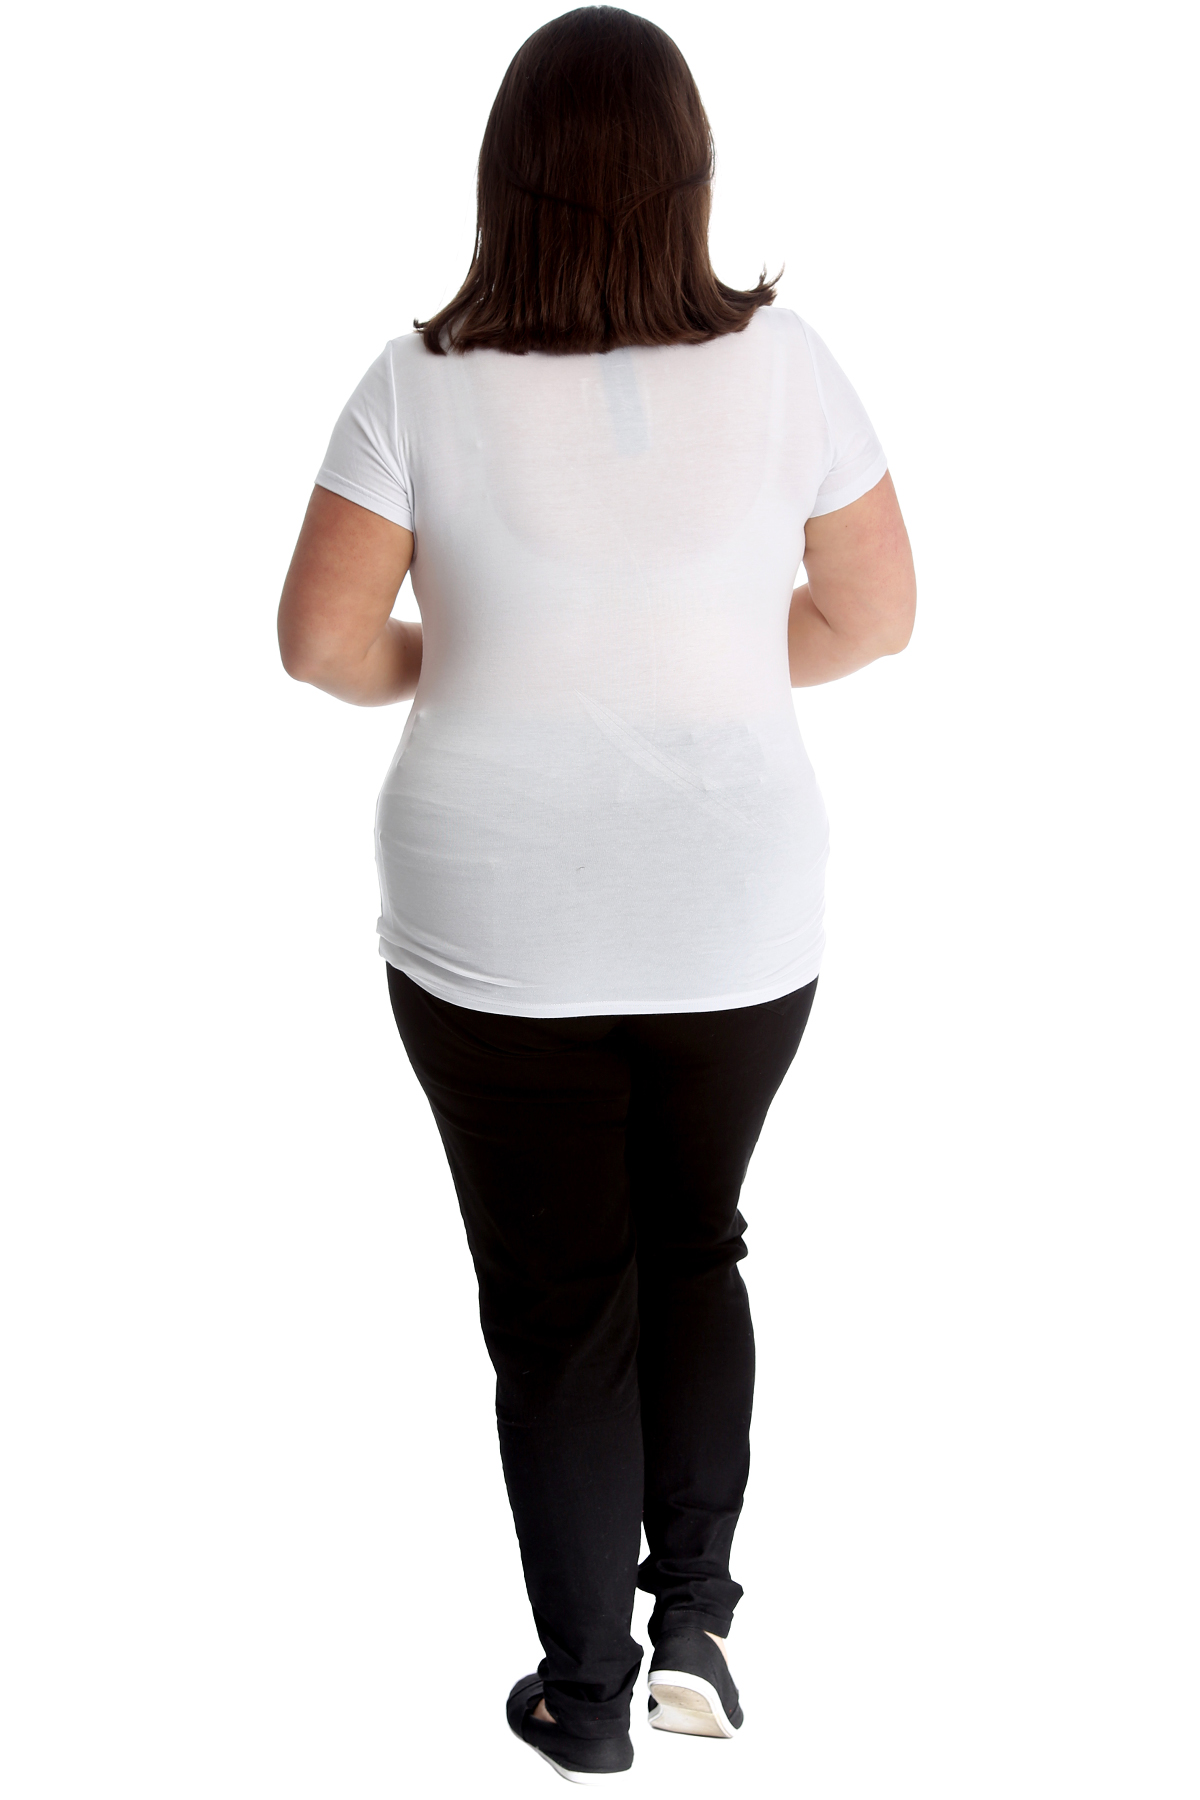 New-Womens-Plus-Size-Top-Ladies-Cherry-Rhinestone-T-Shirt-Soft-Stud-Shiny-Hip thumbnail 18